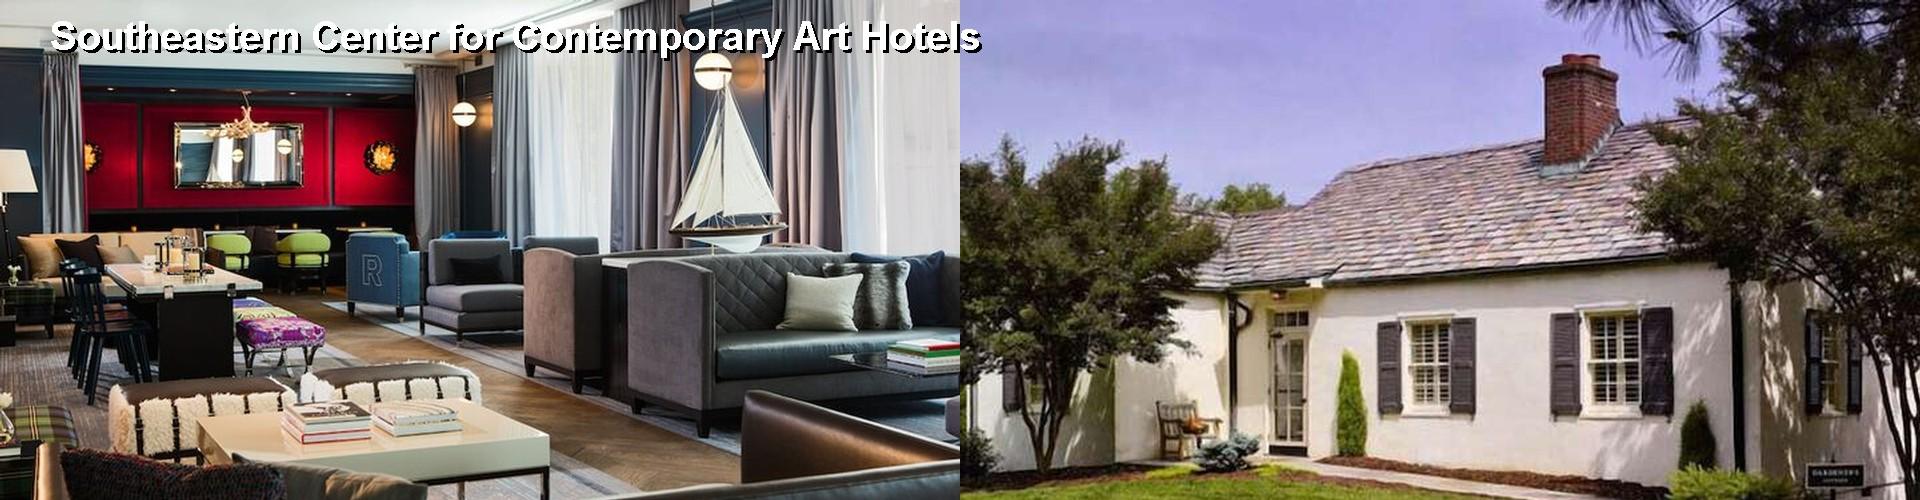 5 Best Hotels Near Southeastern Center For Contemporary Art